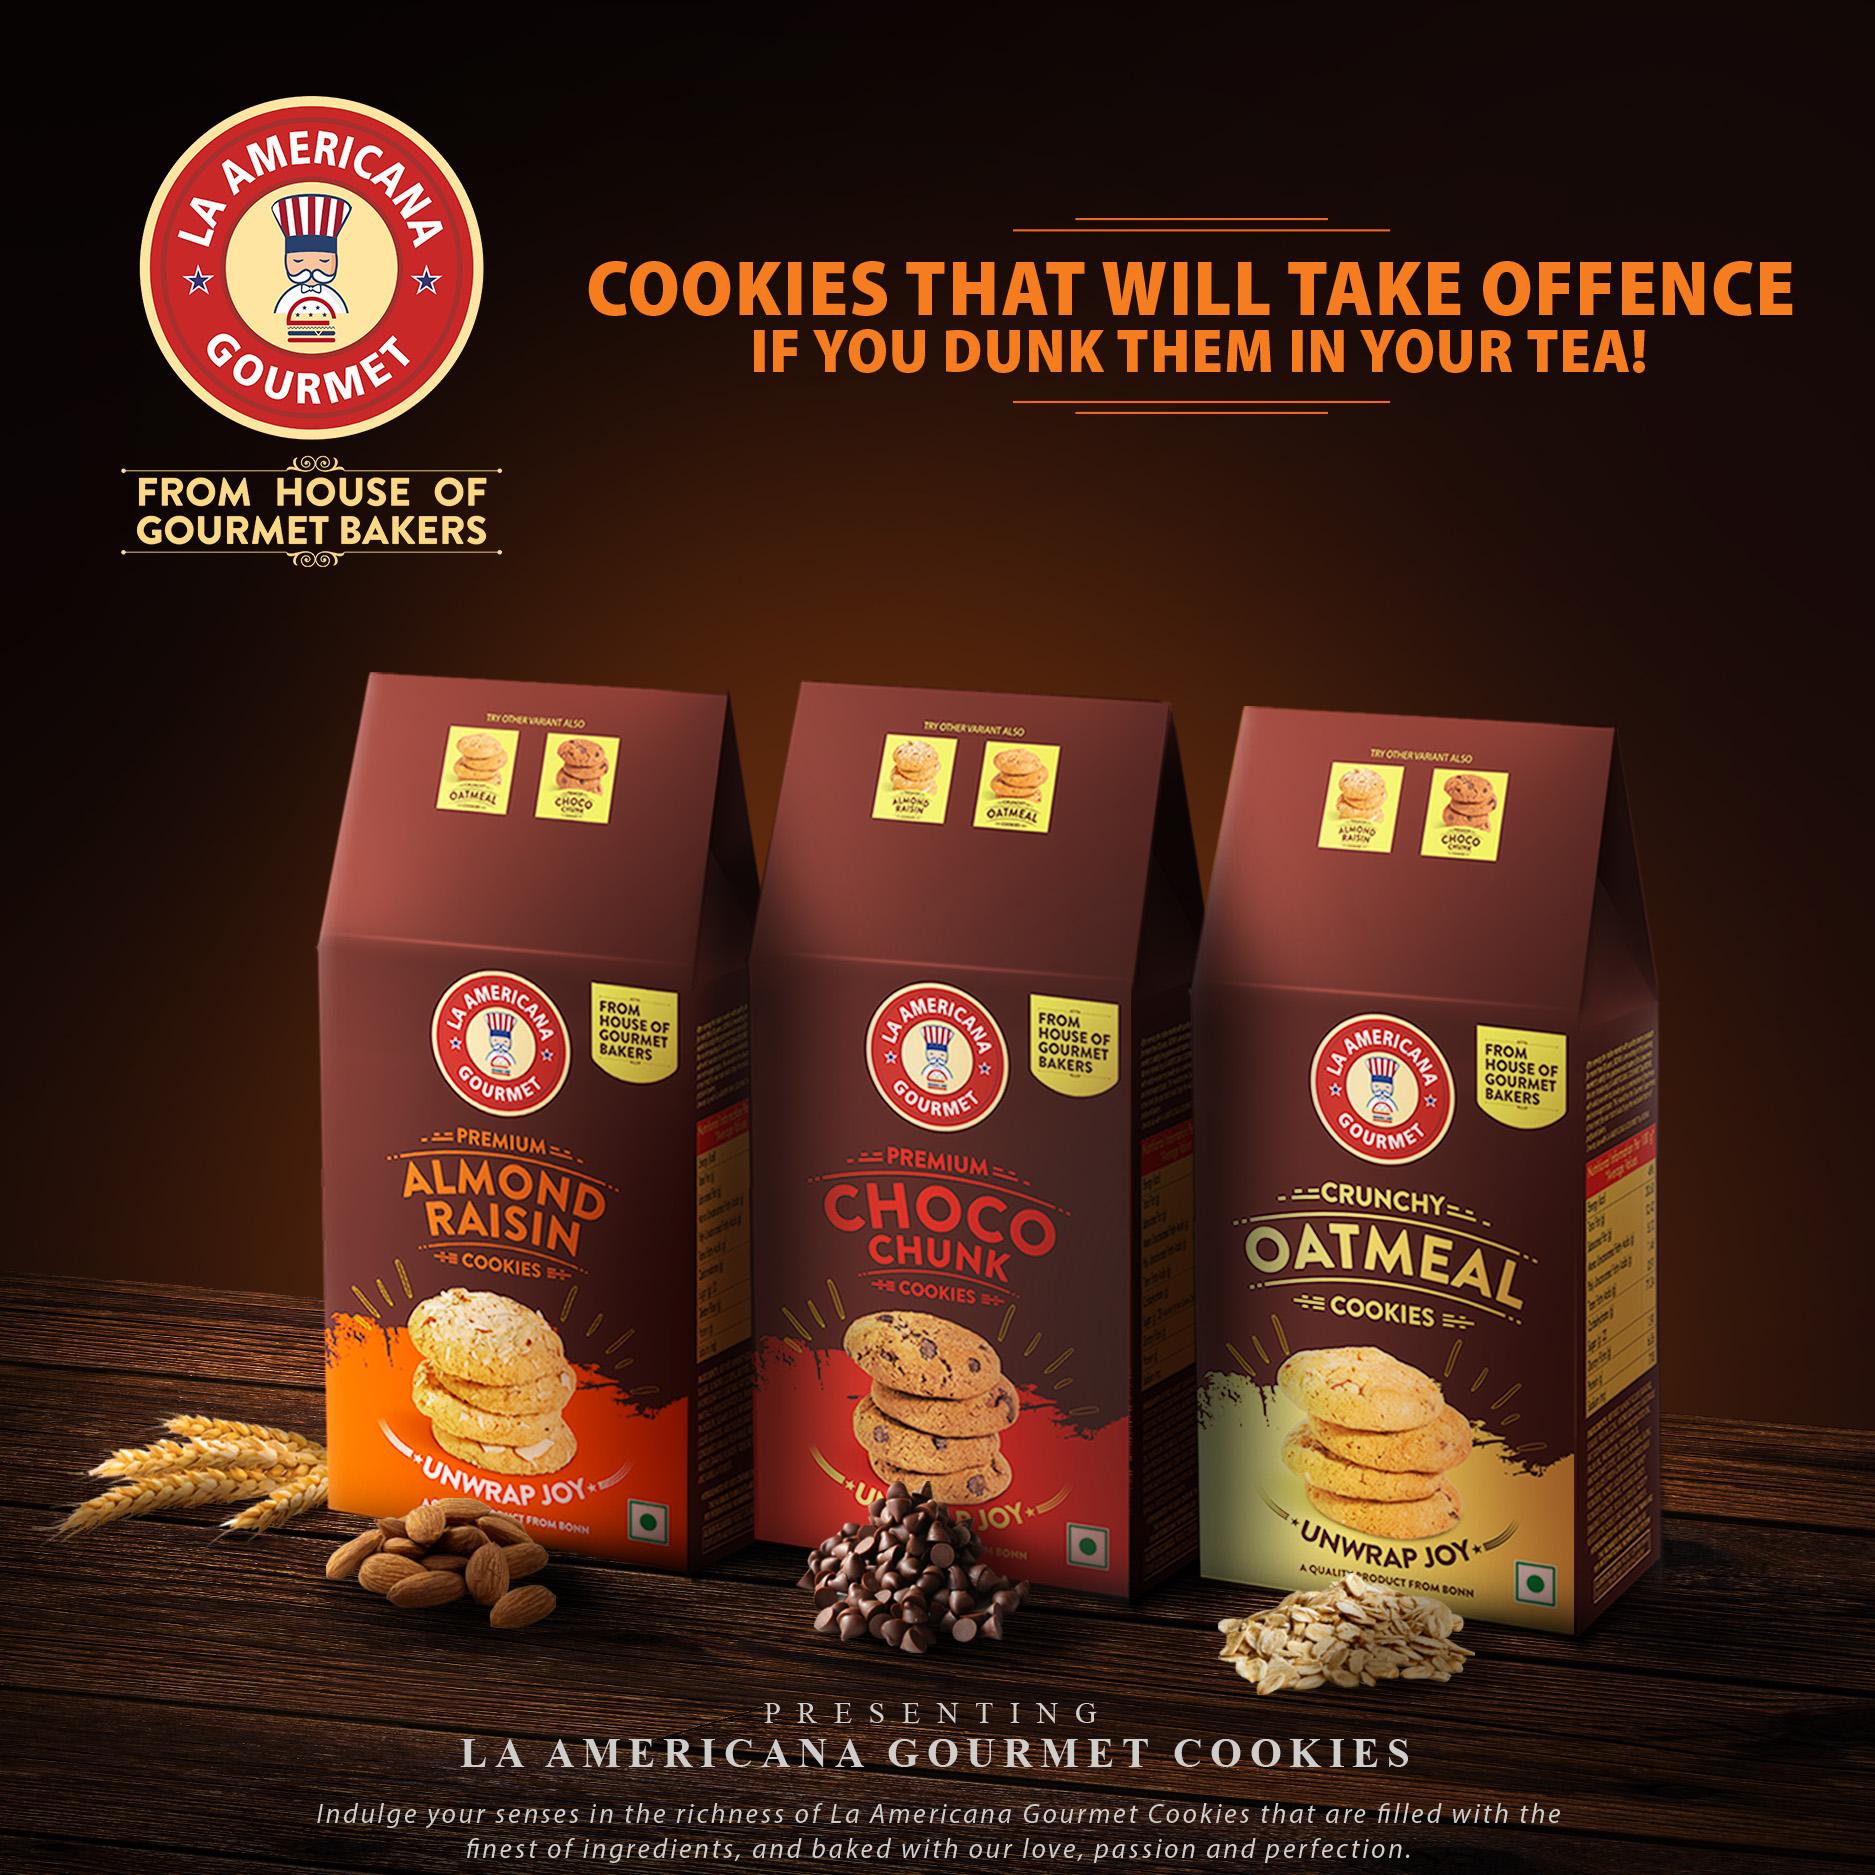 LA Americana Cookies Assorted Pack Almond Raisin, Oatmeal, Choco chunk Cookies 100 g Each